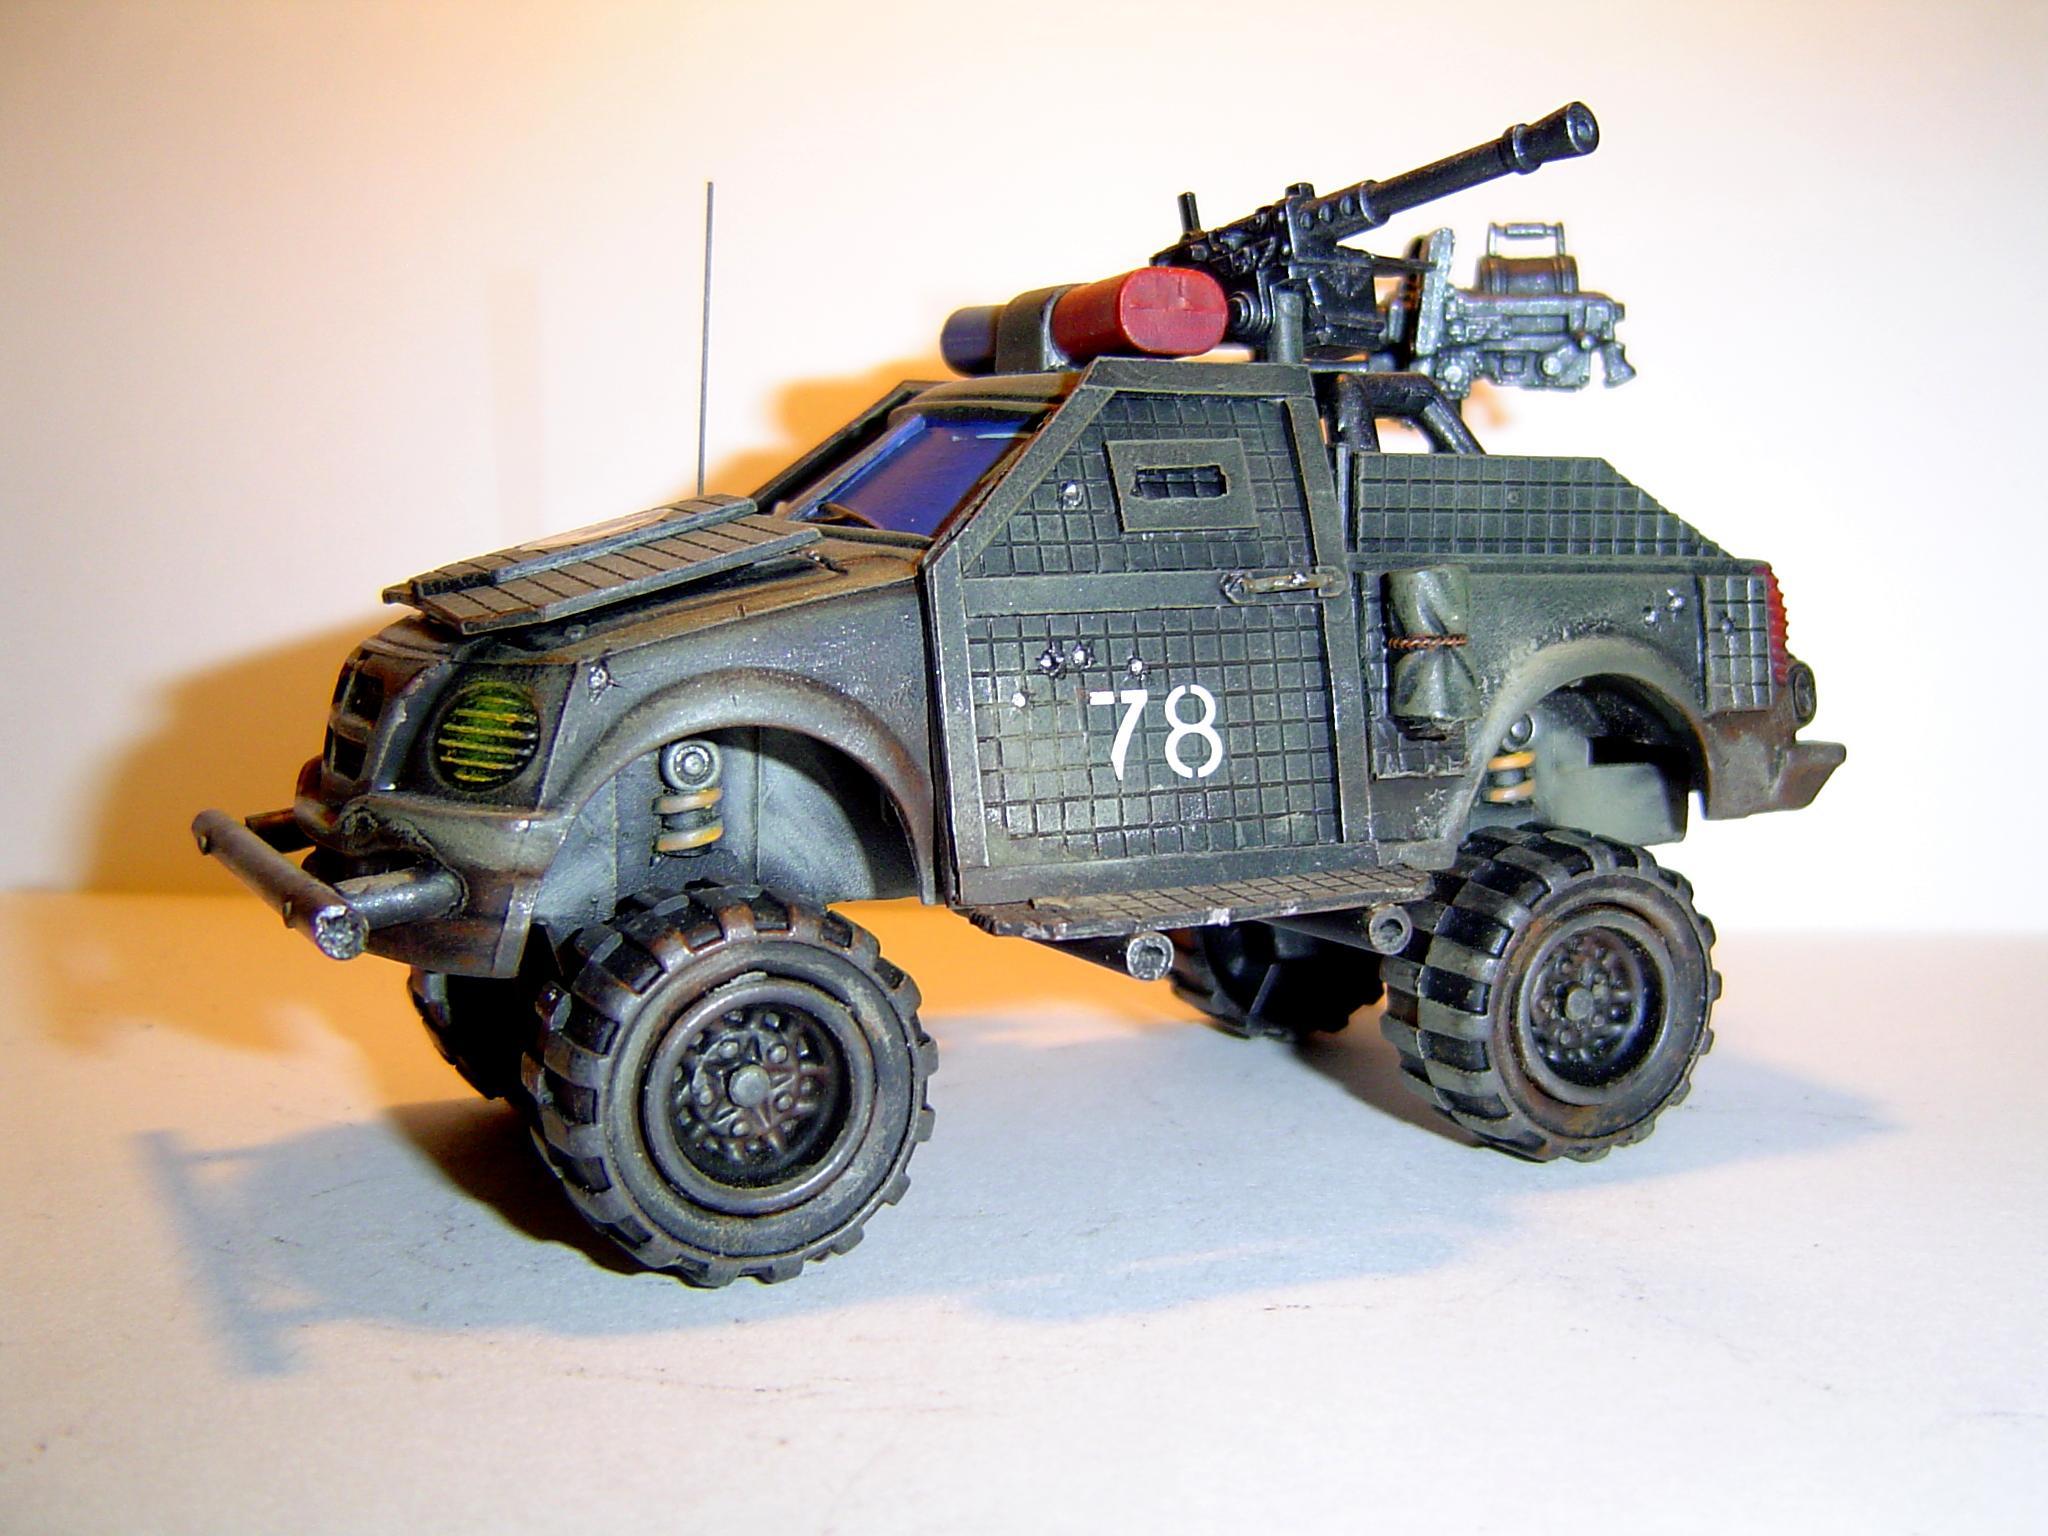 4x4, Imperial Guard, Leman Russ, Space Marines, Steel Legion, Warhammer 40,000